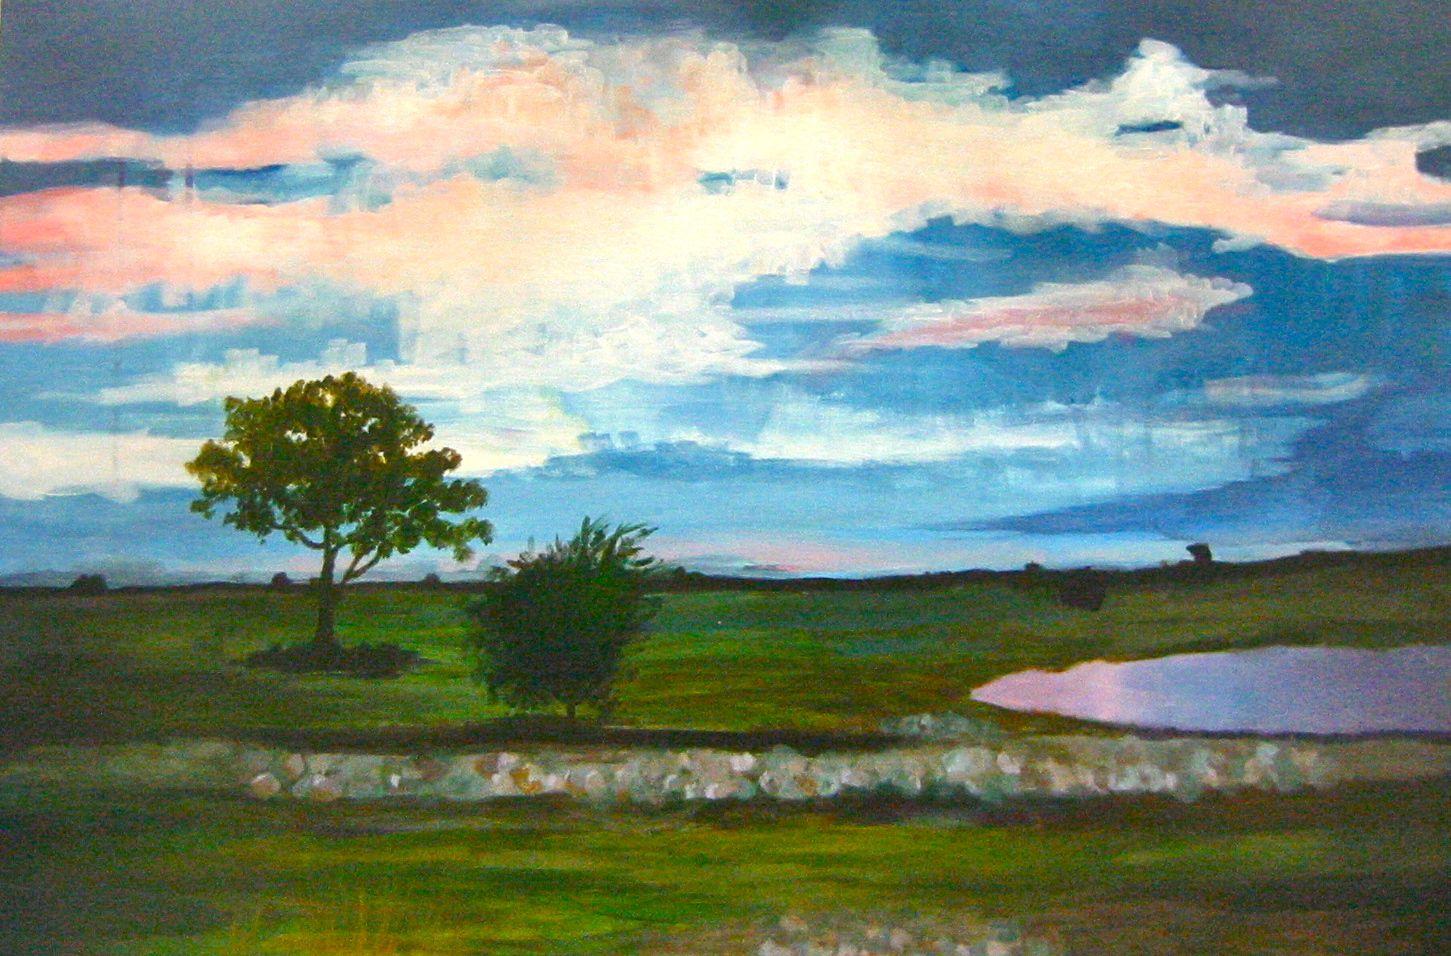 Student Artwork Landscape Nature Painting Oilpainting Sky Trees Grass Lake Art Corporate Art New York Art